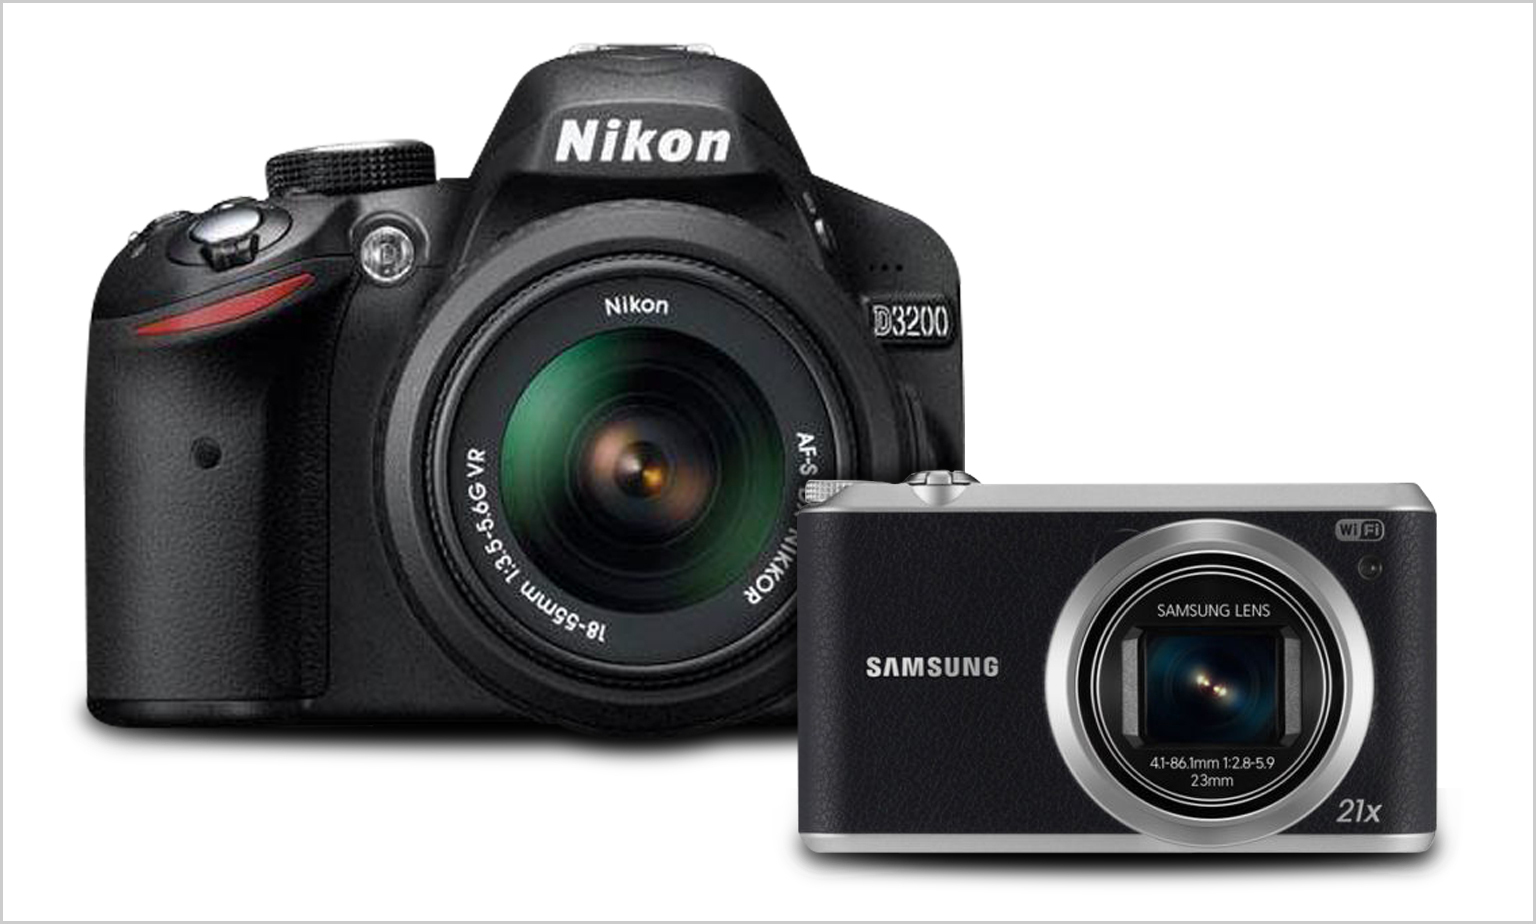 Refurbished Cameras Up to 50% Off